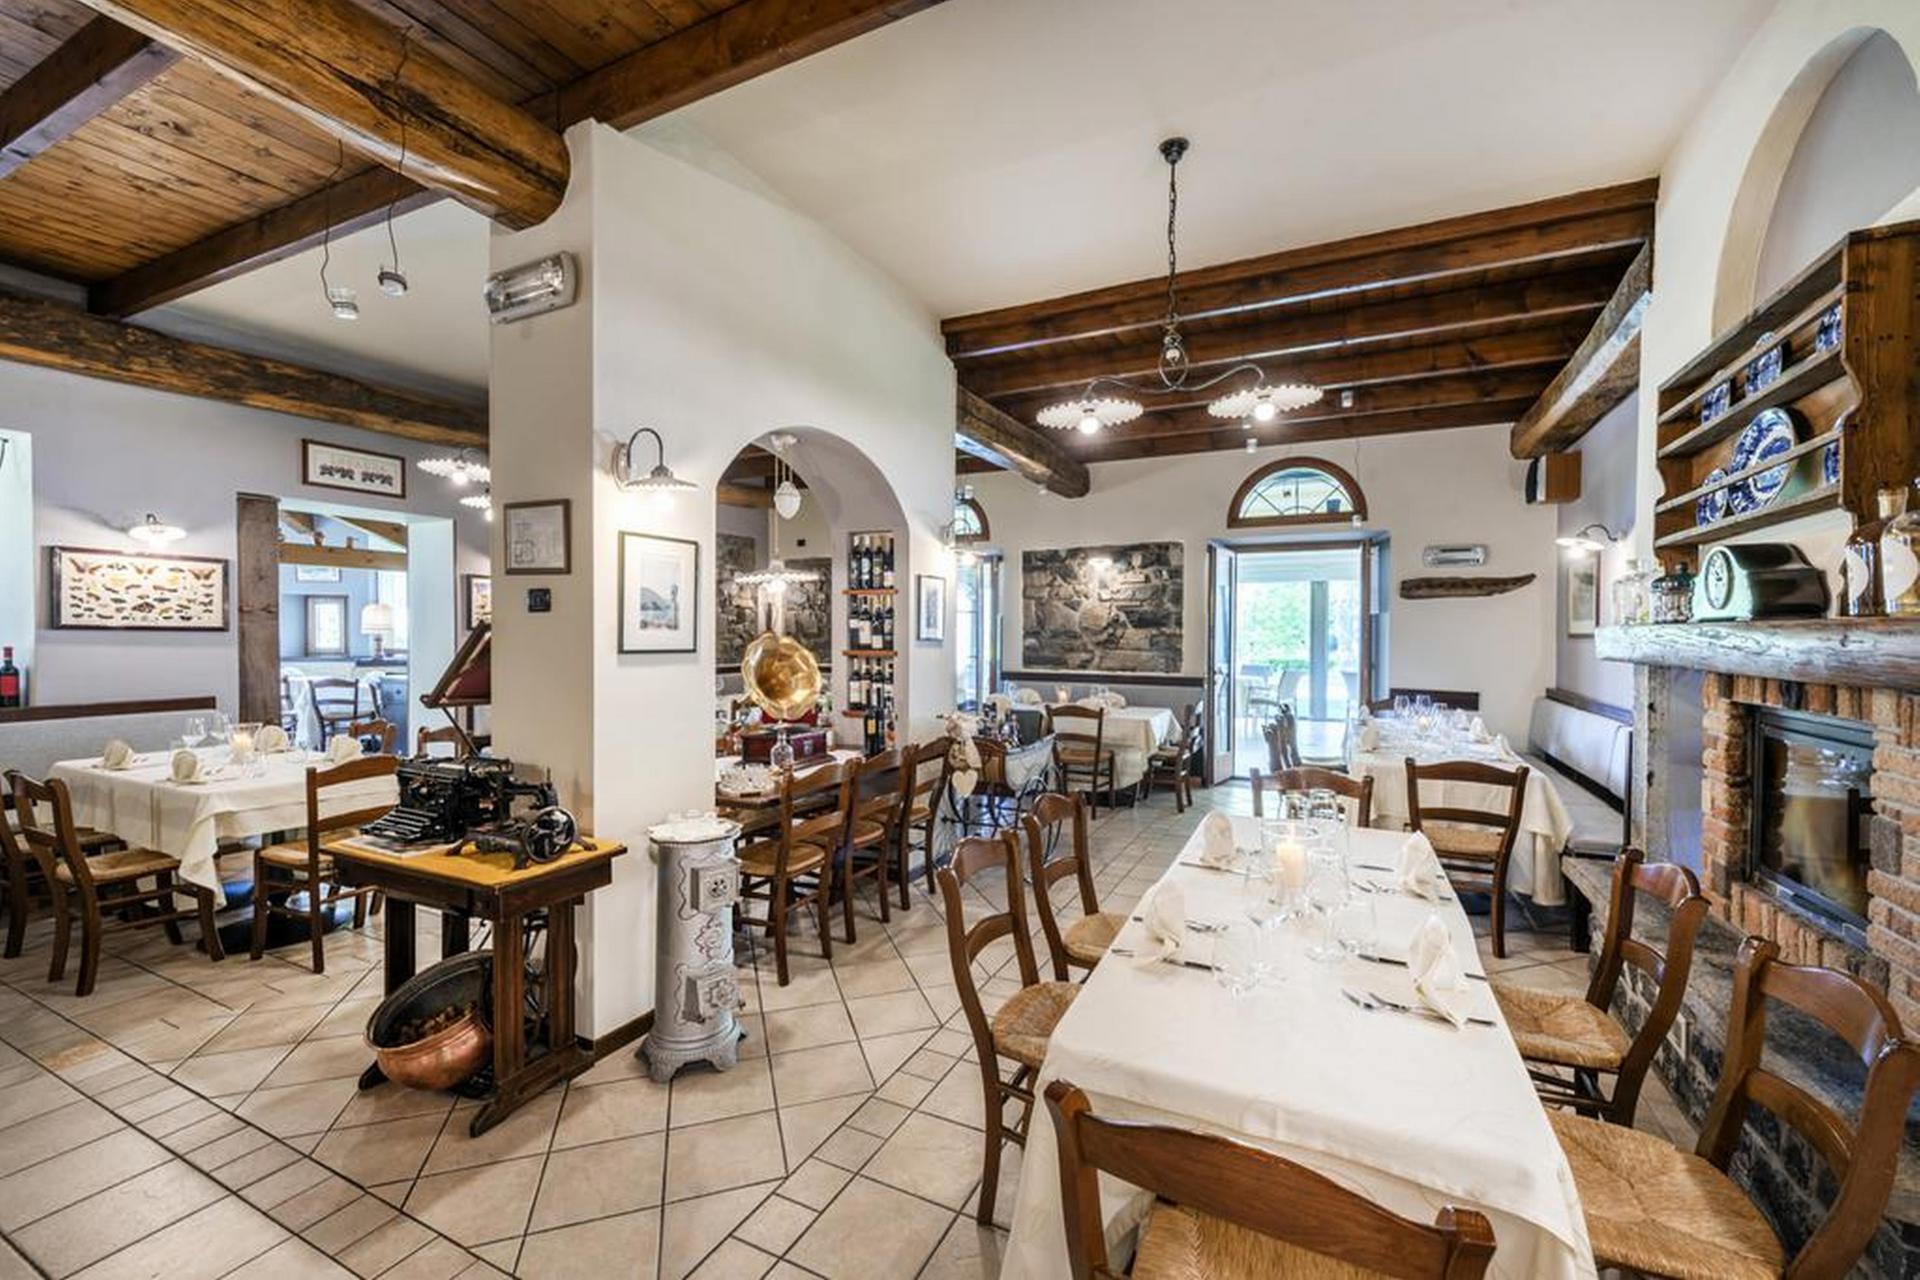 Agriturismo Lake Como and Lake Garda Agriturismo with restaurant and views of Lake Como